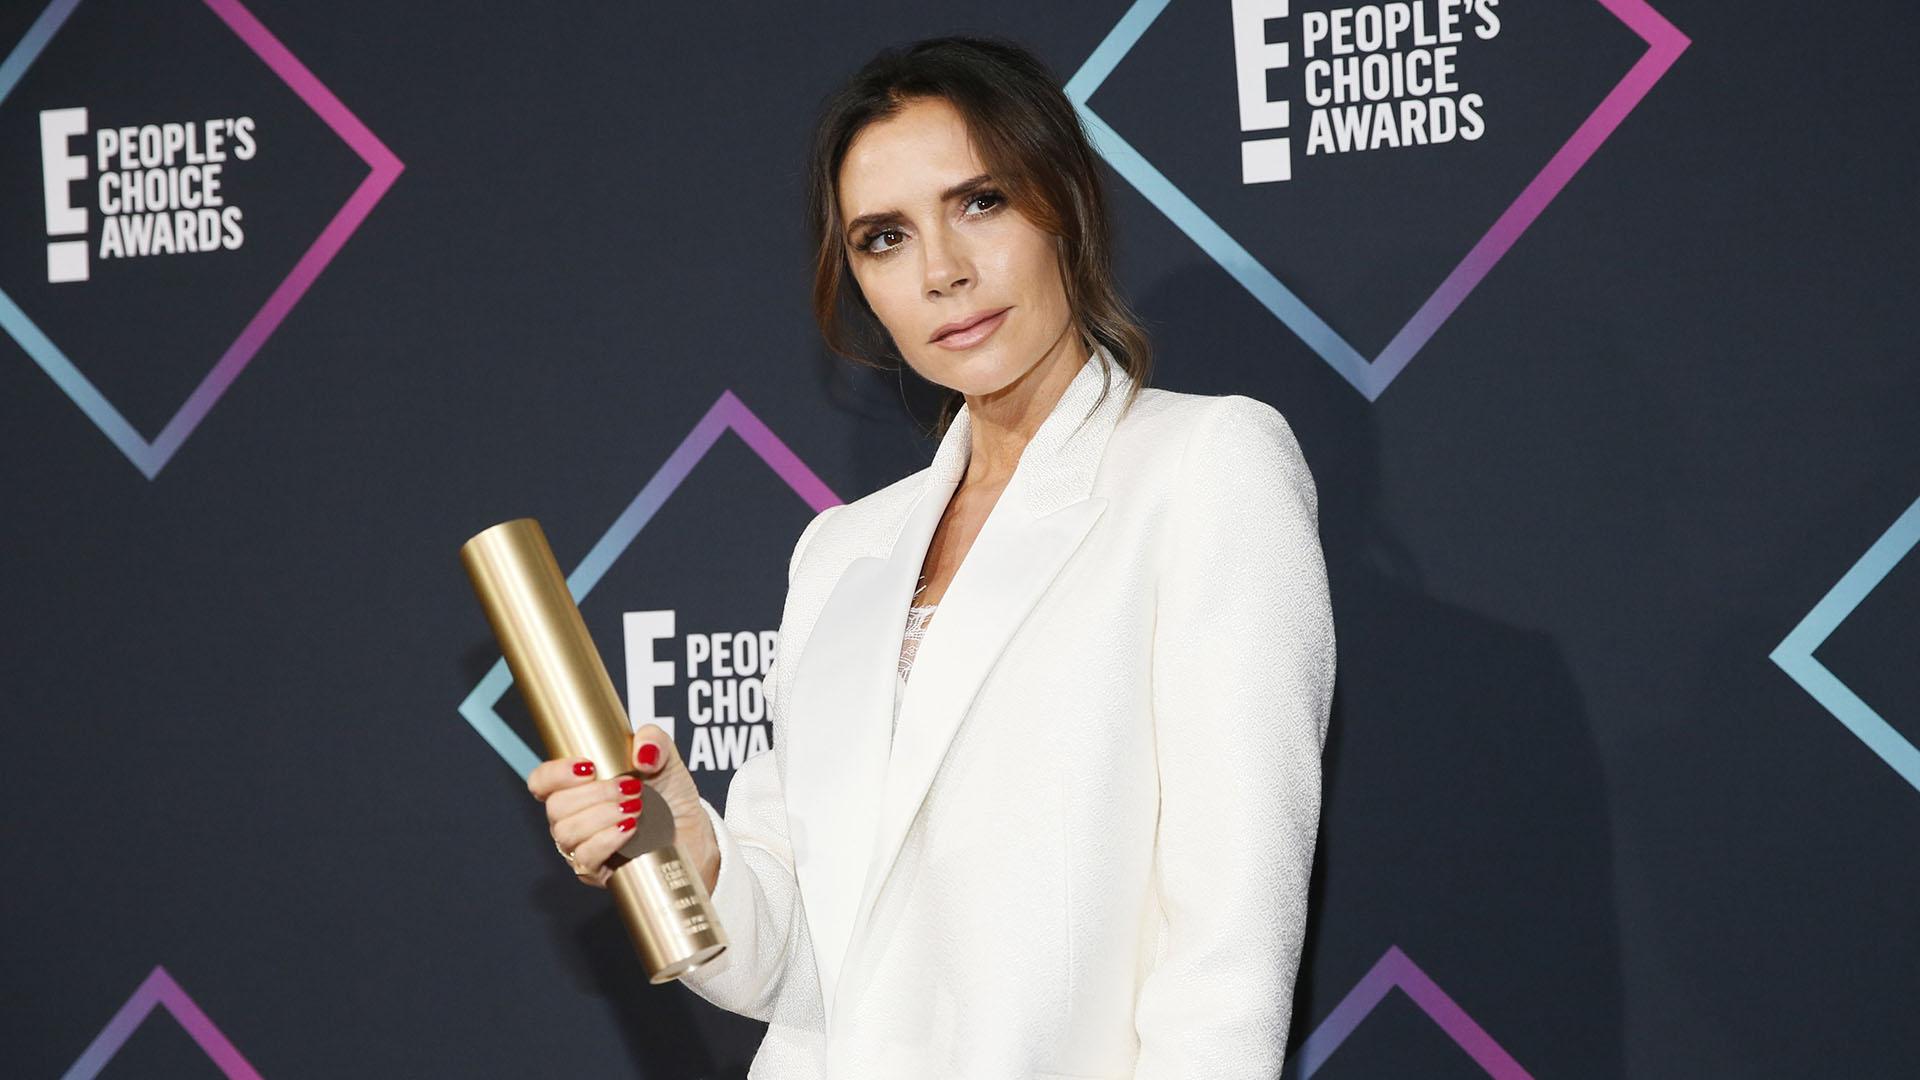 Victoria Beckham ganó el Fashion Icon Award del canal E! este año. REUTERS/Danny Moloshok